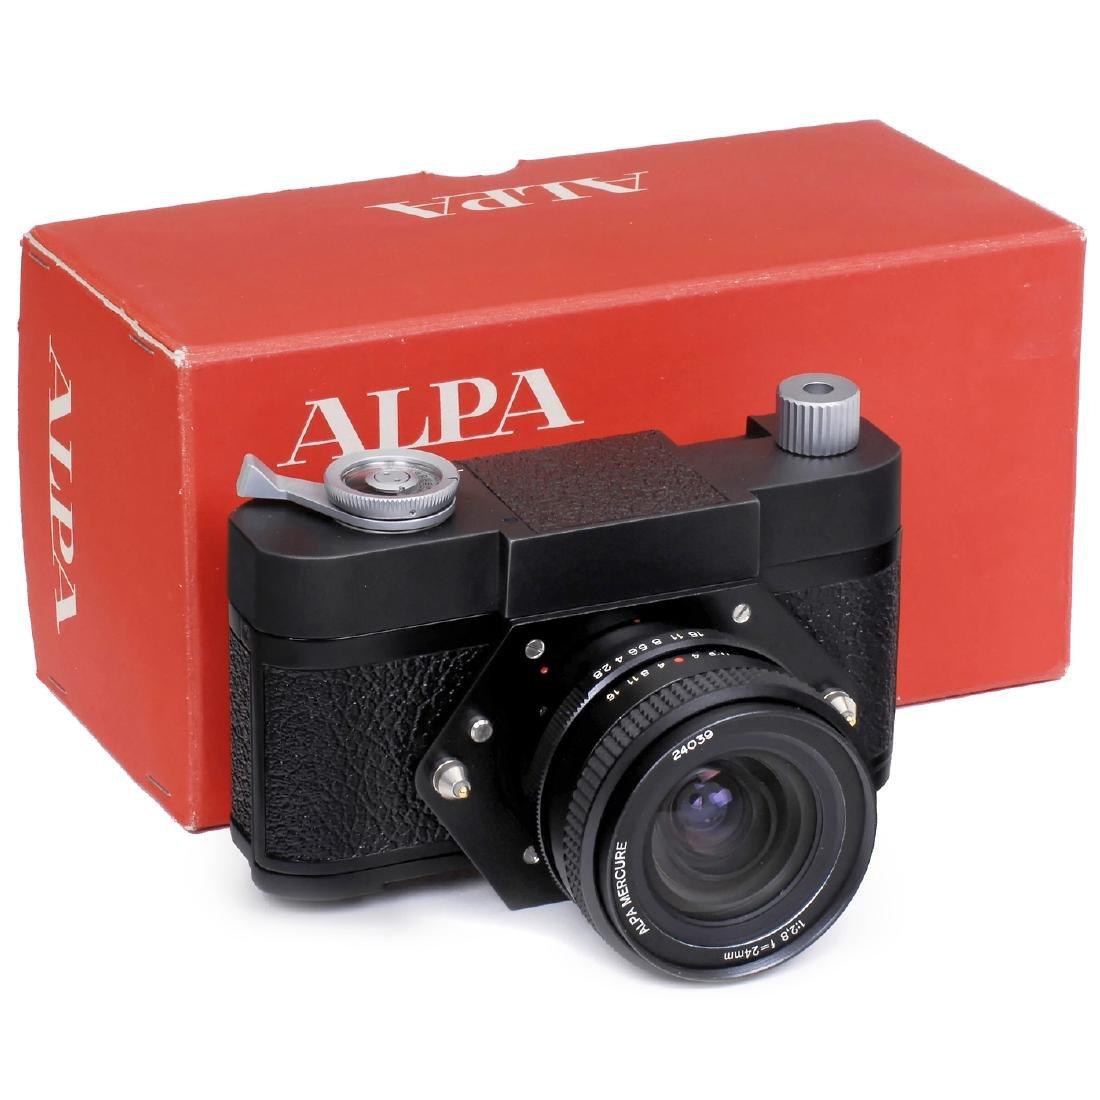 Alpa 11m Mercure, 1974